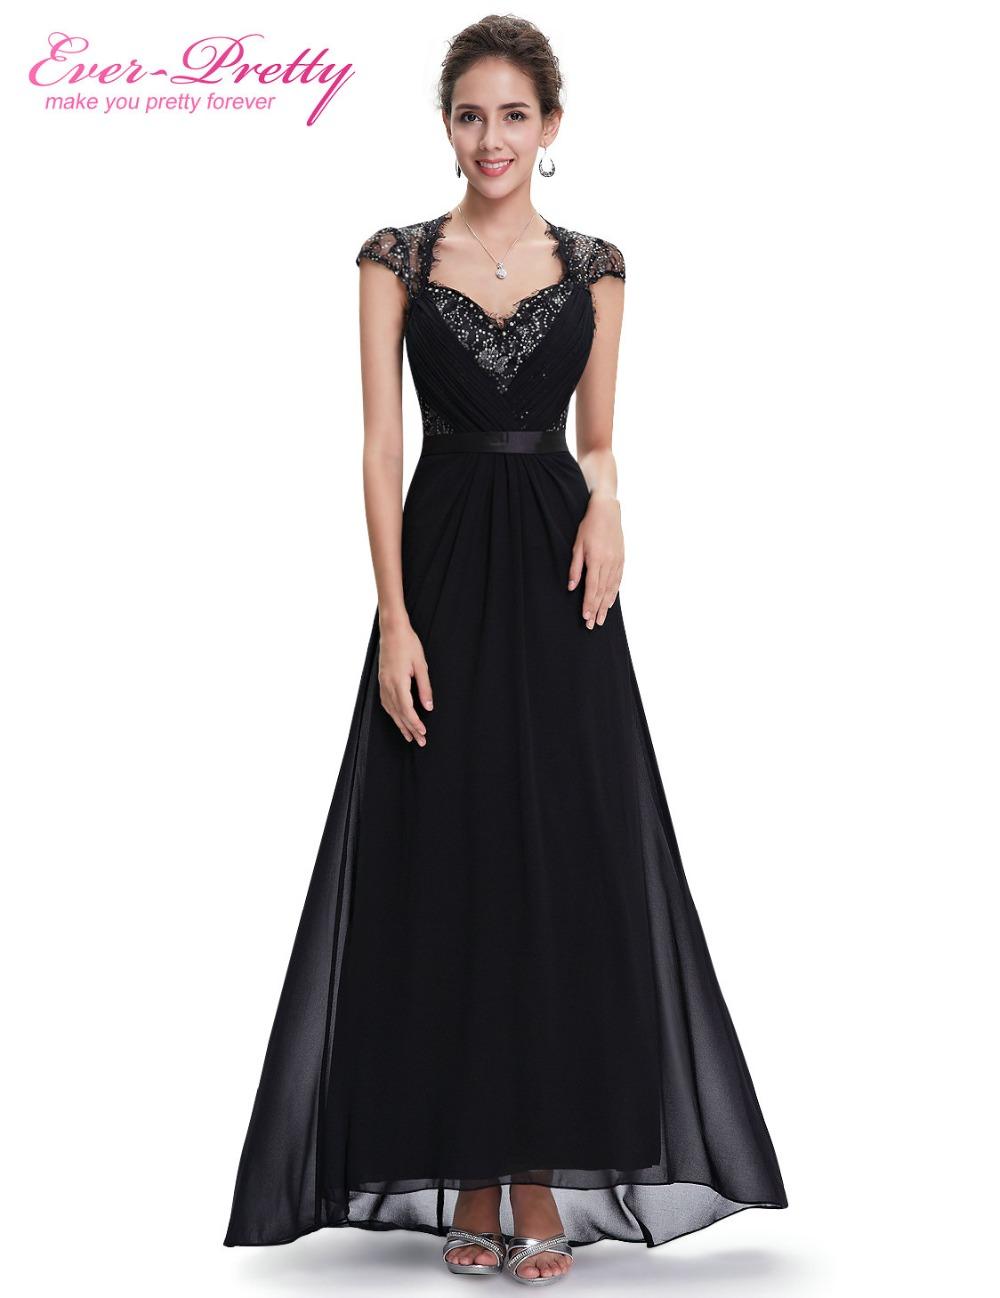 Luxury Lady Chiffon Long Dresses Summer Style Women Casual Vestidos 2015 High